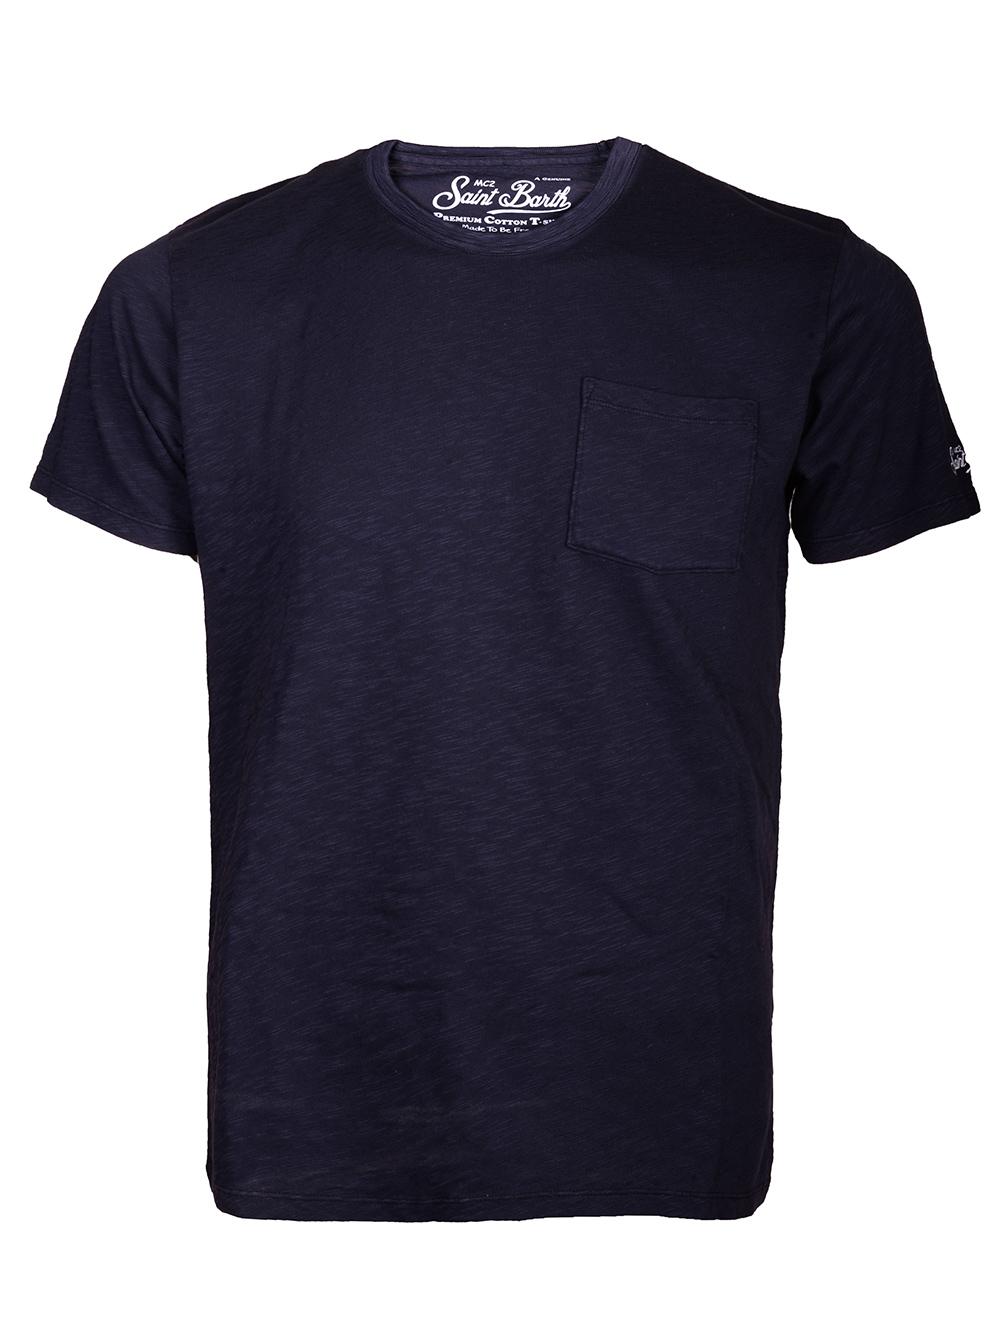 Mc2 St.BarthSALT WATER Μπλούζα t-shirt PRE0001 ΜΠΛΕ